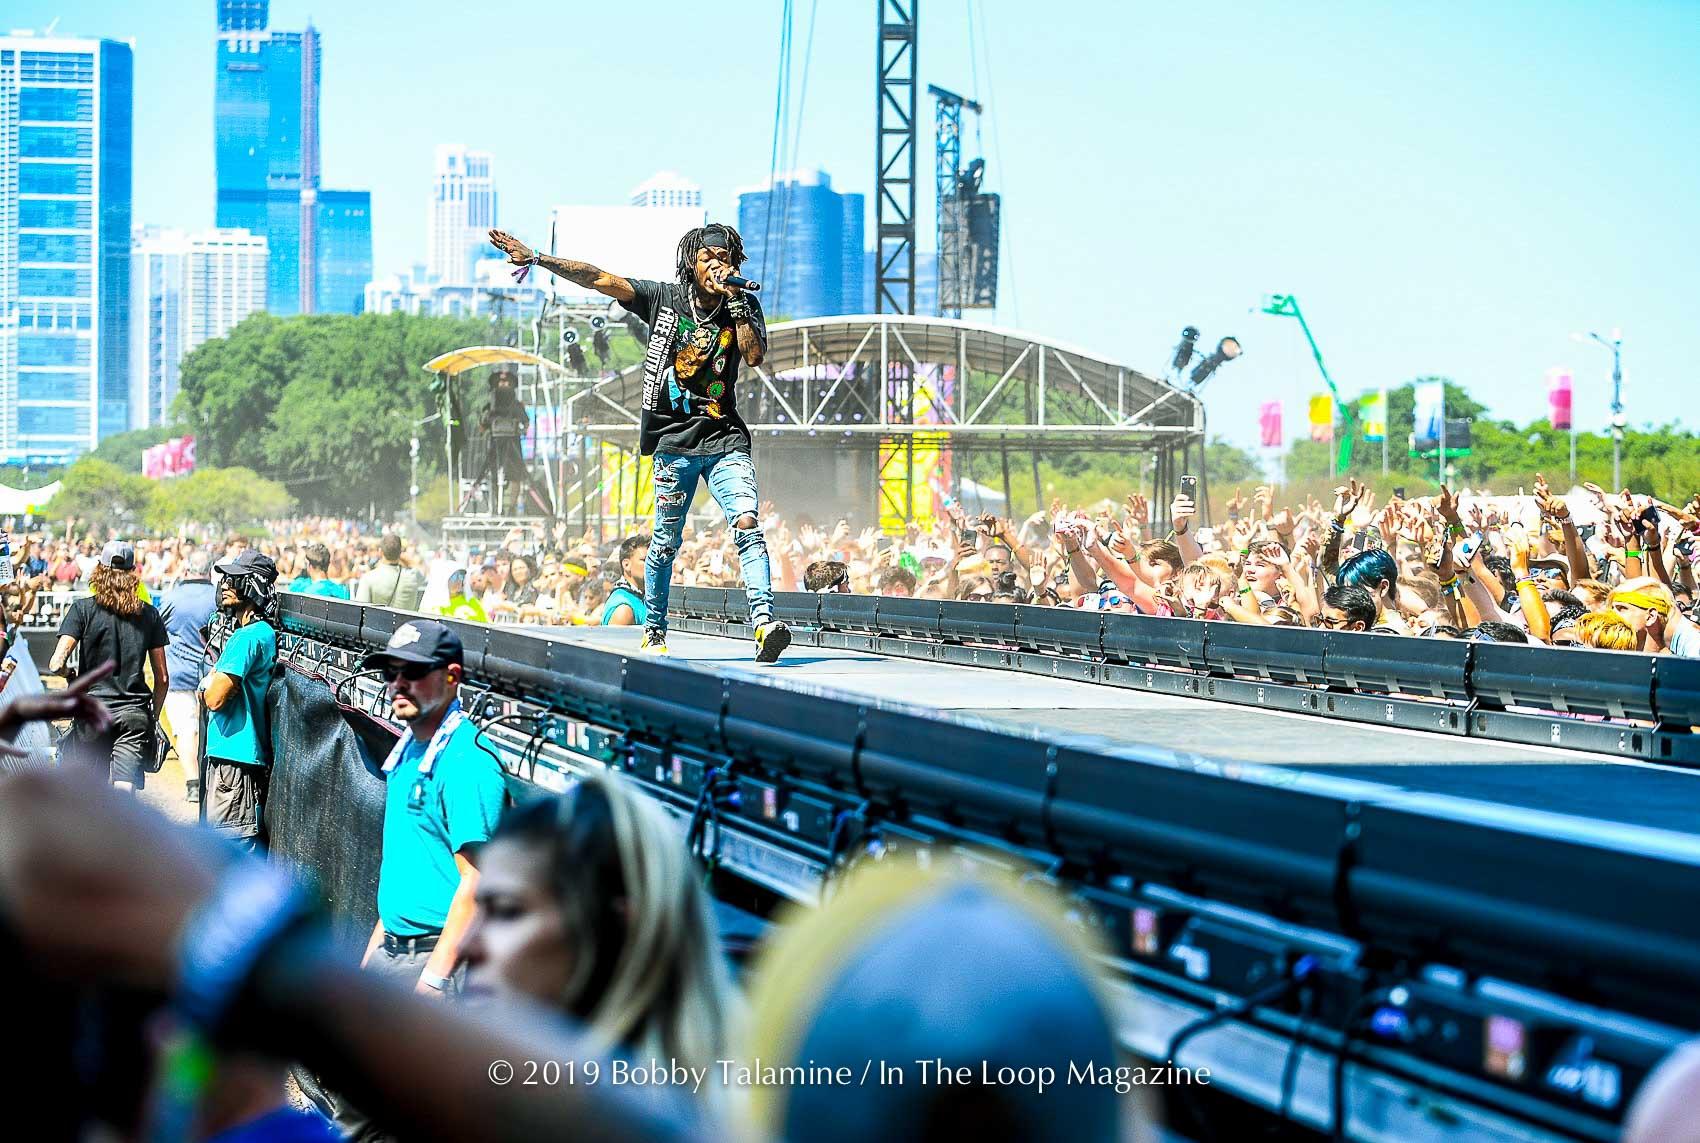 Lollapalooza 2019 Highlights: Day 4